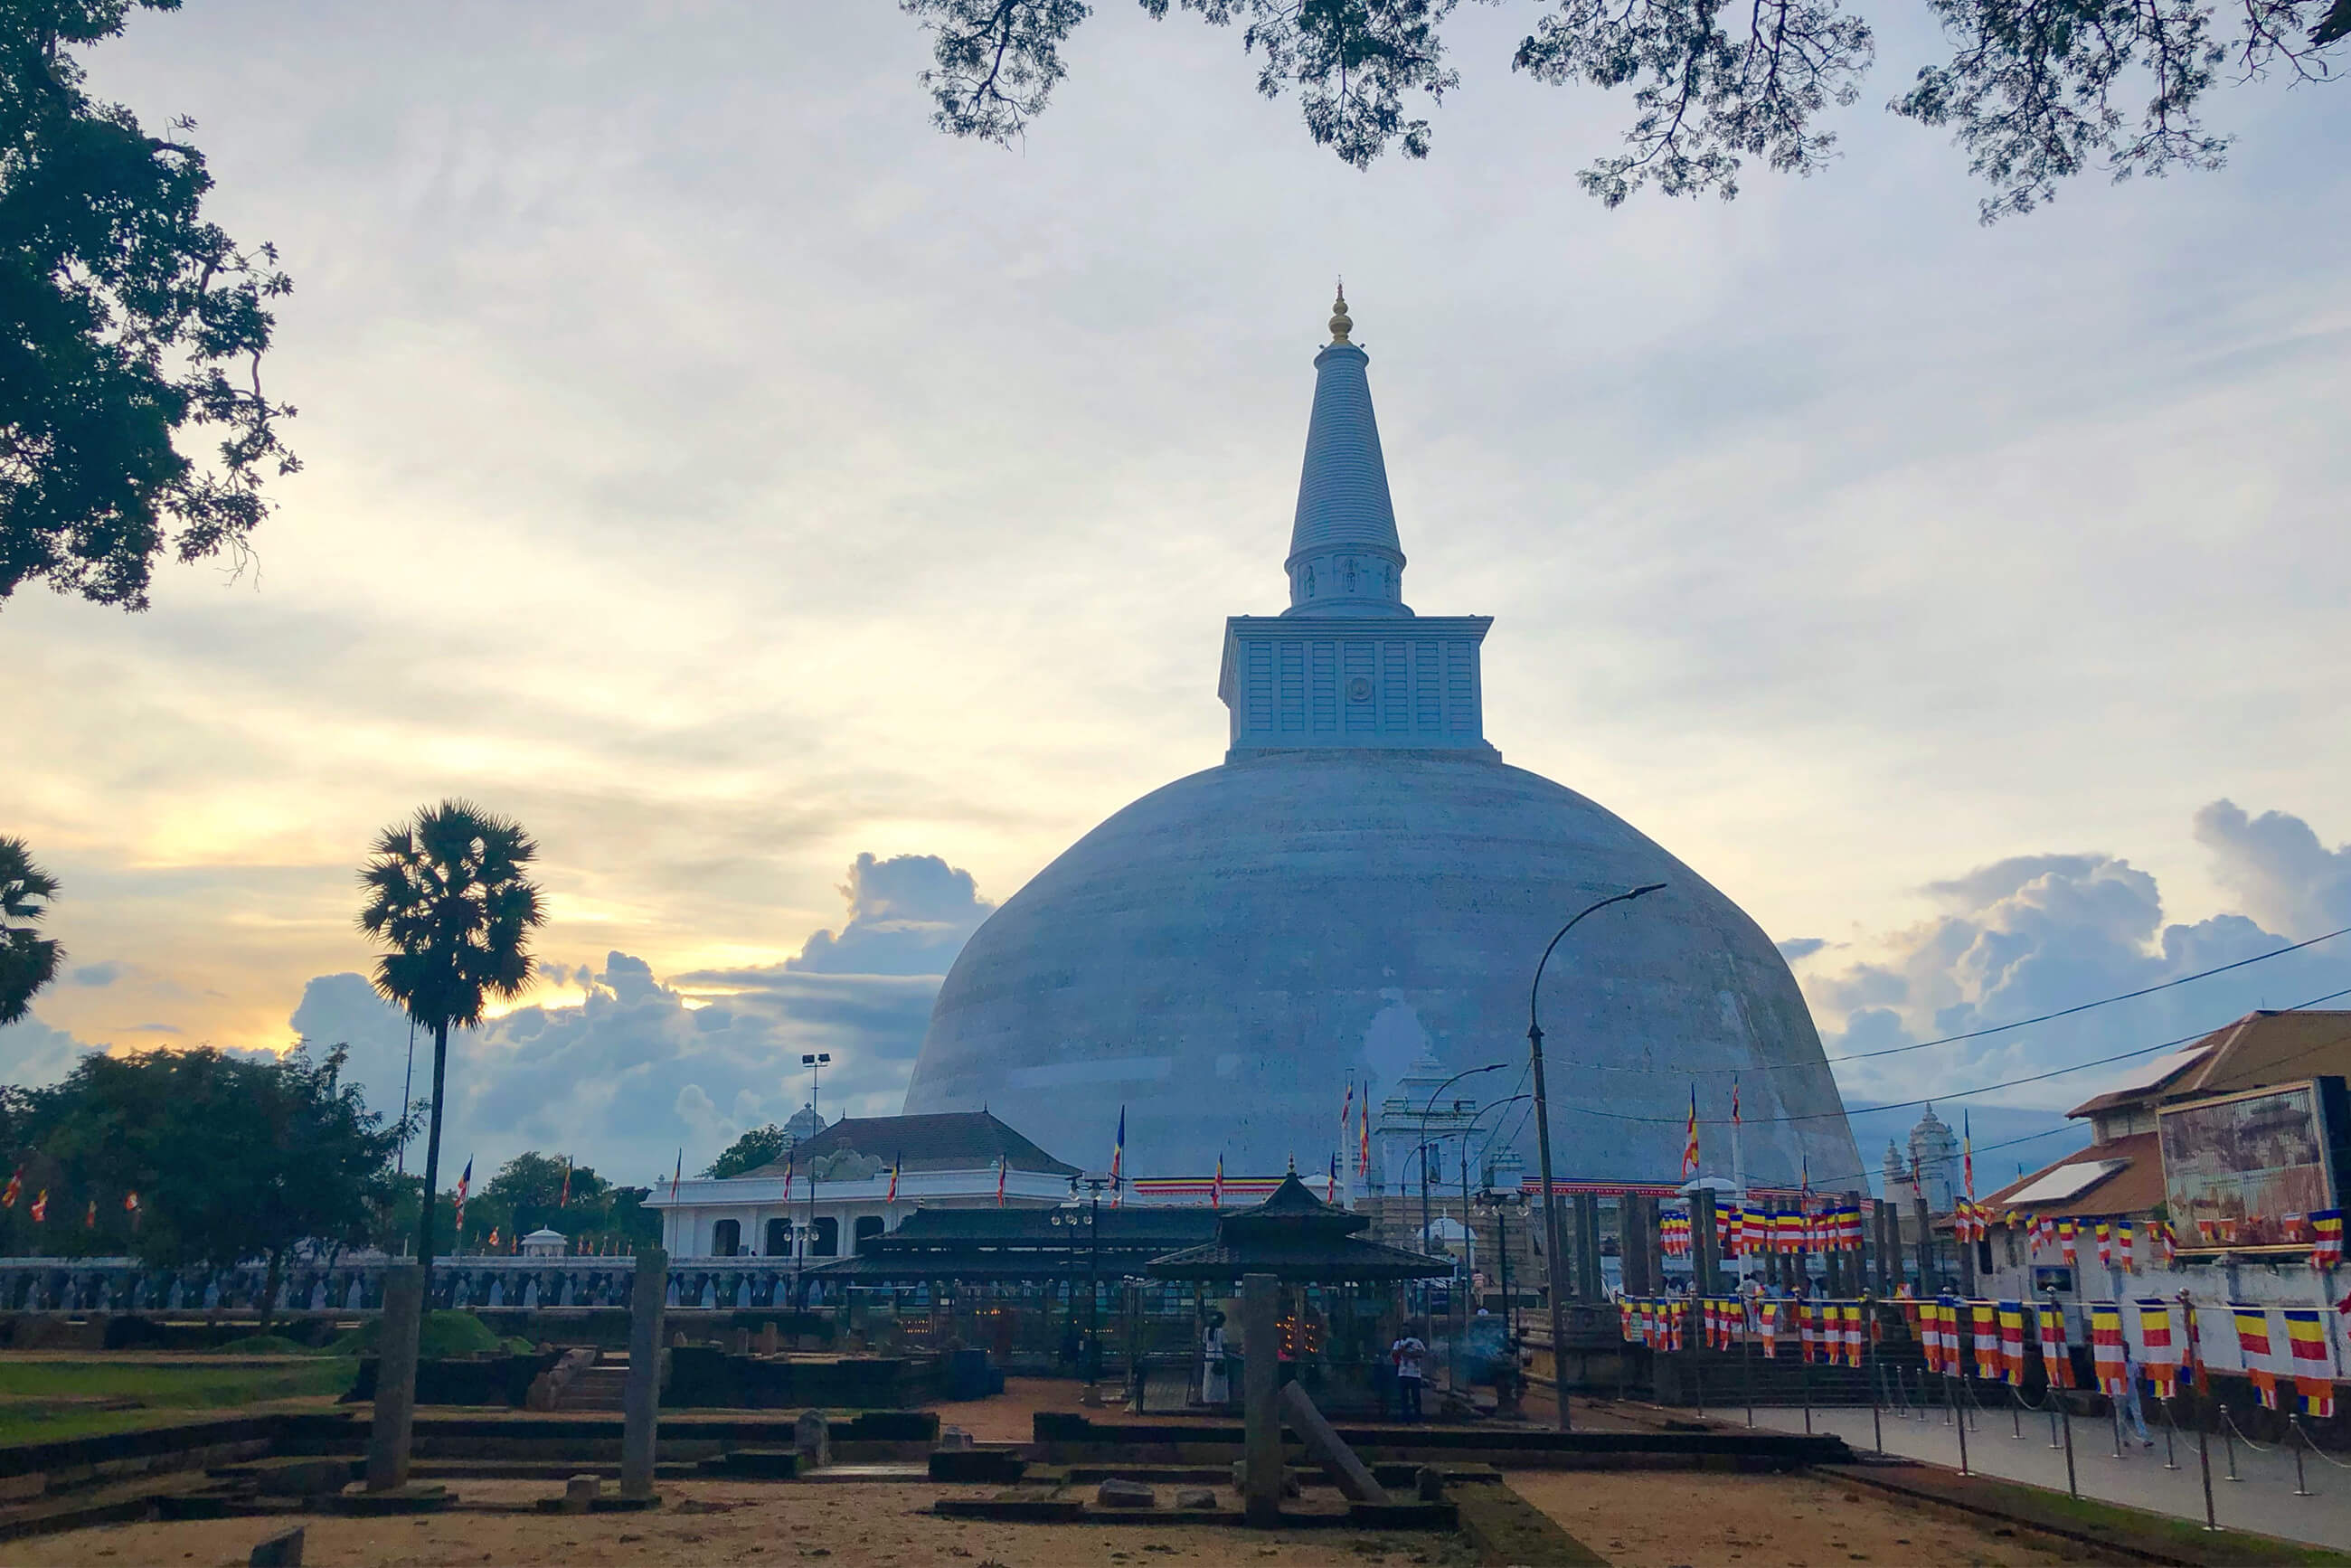 https://bubo.sk/uploads/galleries/7521/martinferencik_srilanka_photo-03-02-2019-13-24-28-1.jpg